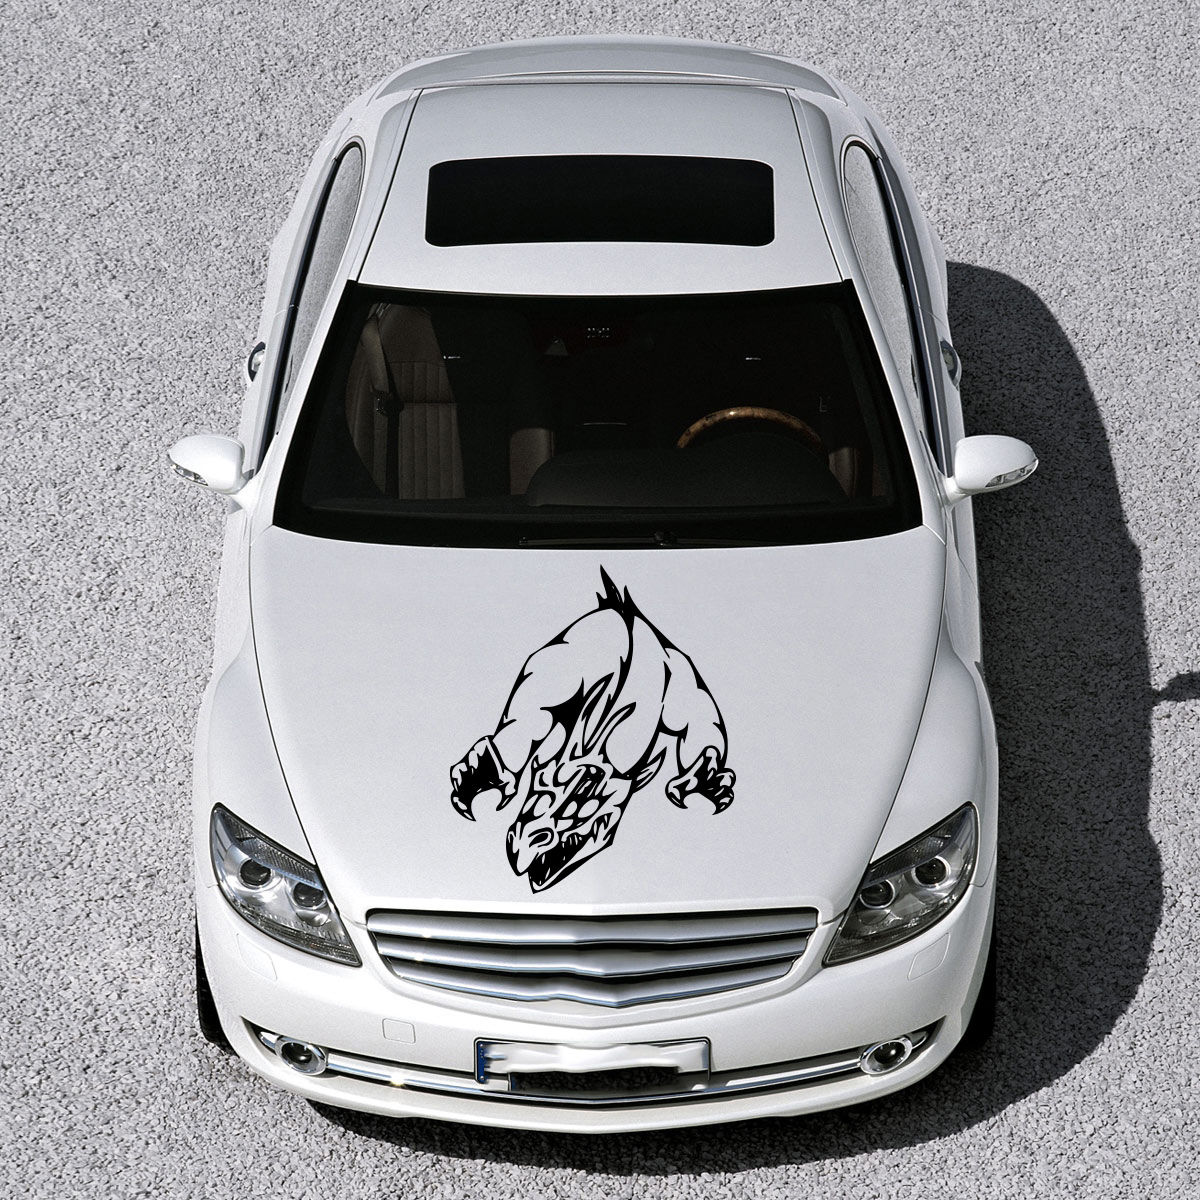 Car sticker design online - Car Hood Vinyl Sticker Decals Graphics Design Art